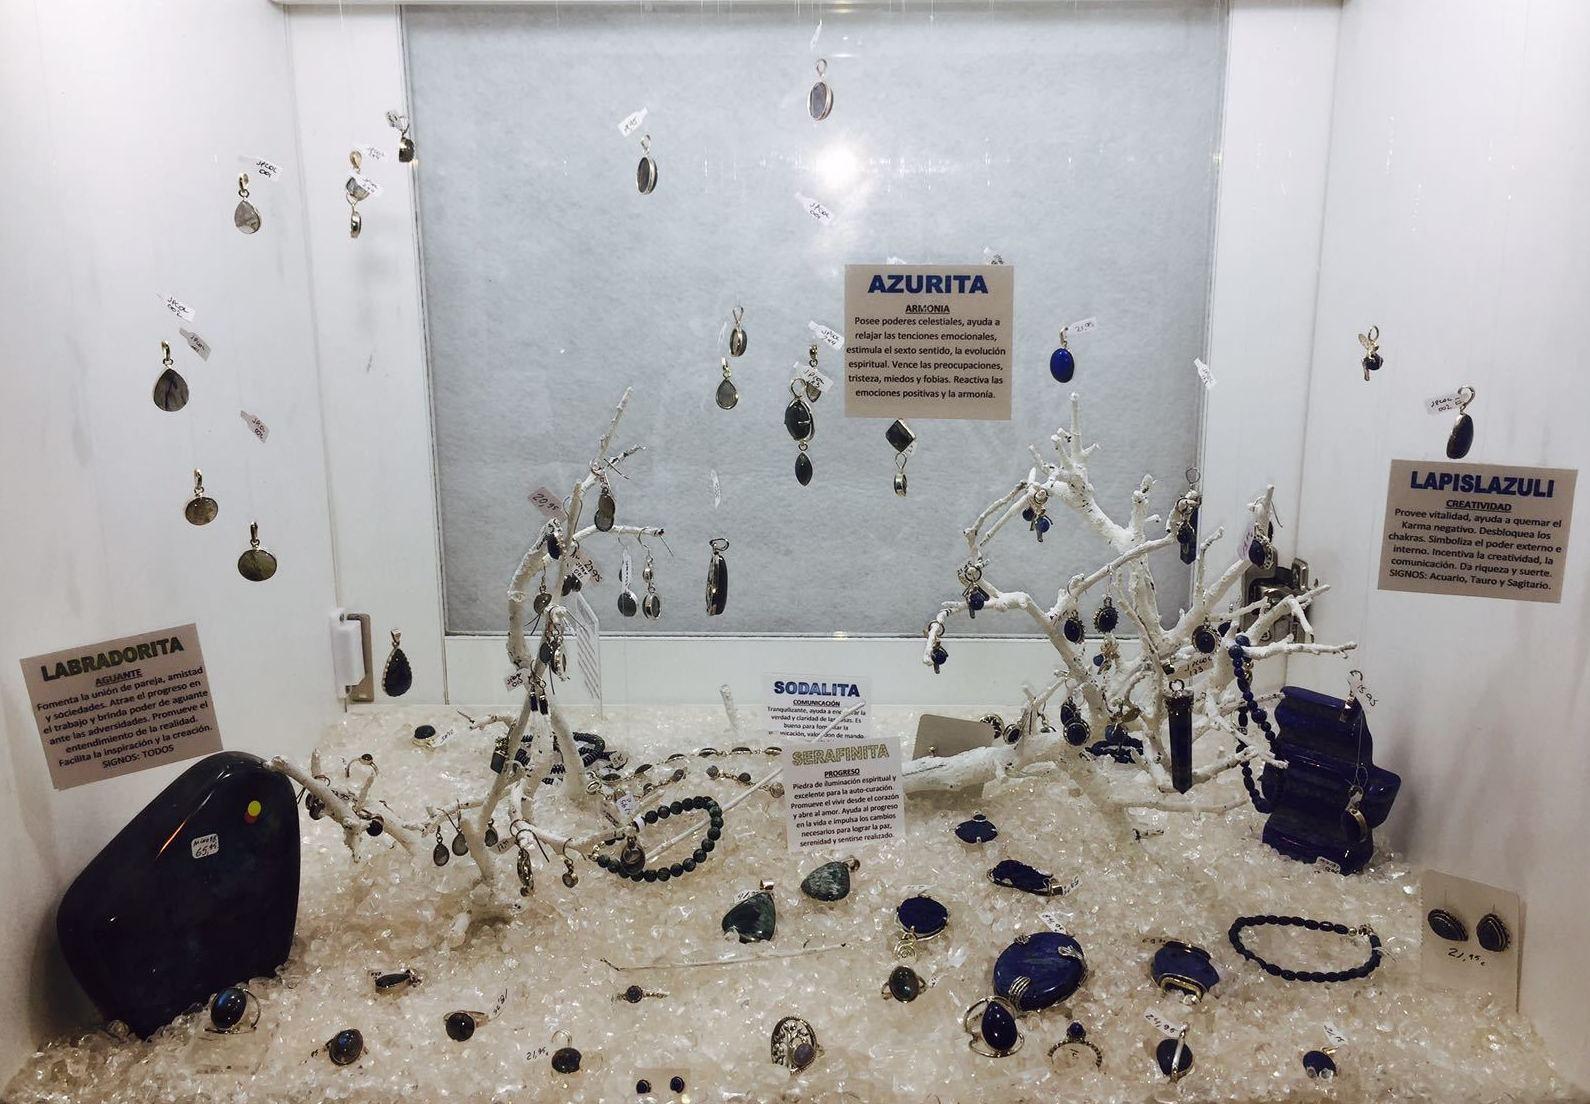 Lapislázuli , labradorira , serafinita , azurita, sodalita y hematite. Minerales engarzados en plata